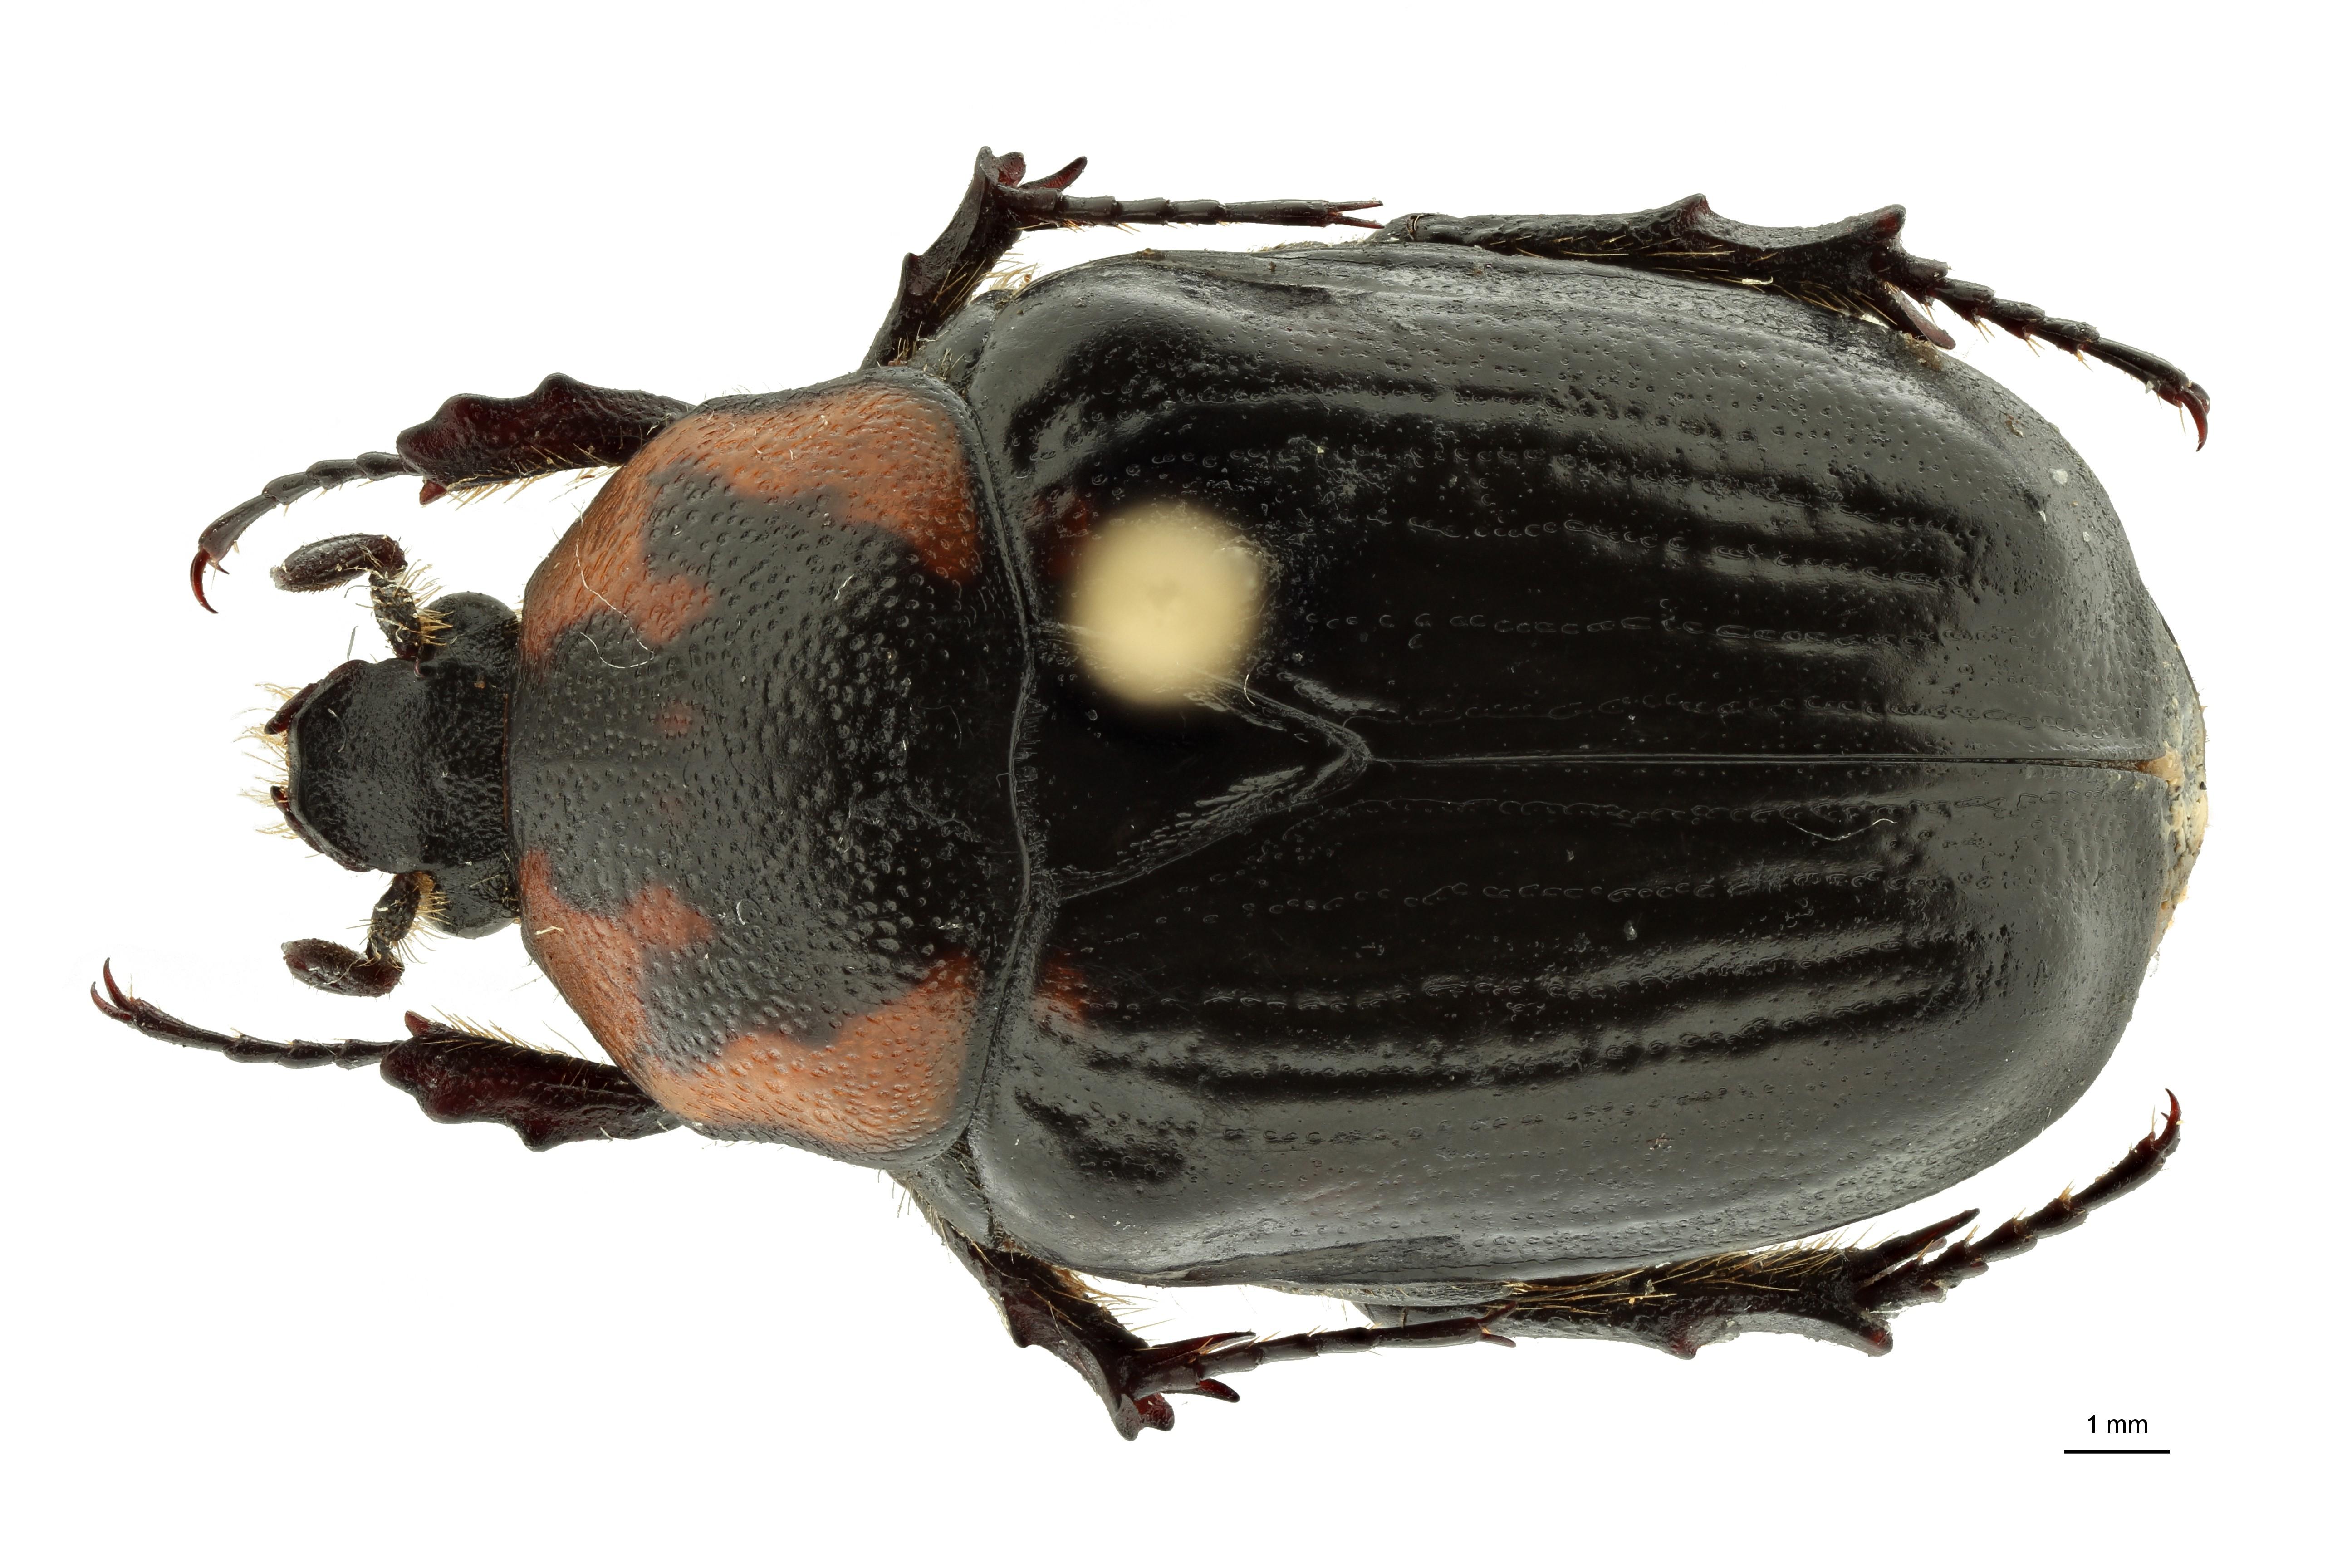 Anoplocheilus (Diplognathoides) werneri nt2 M D ZS PMax Scaled.jpeg